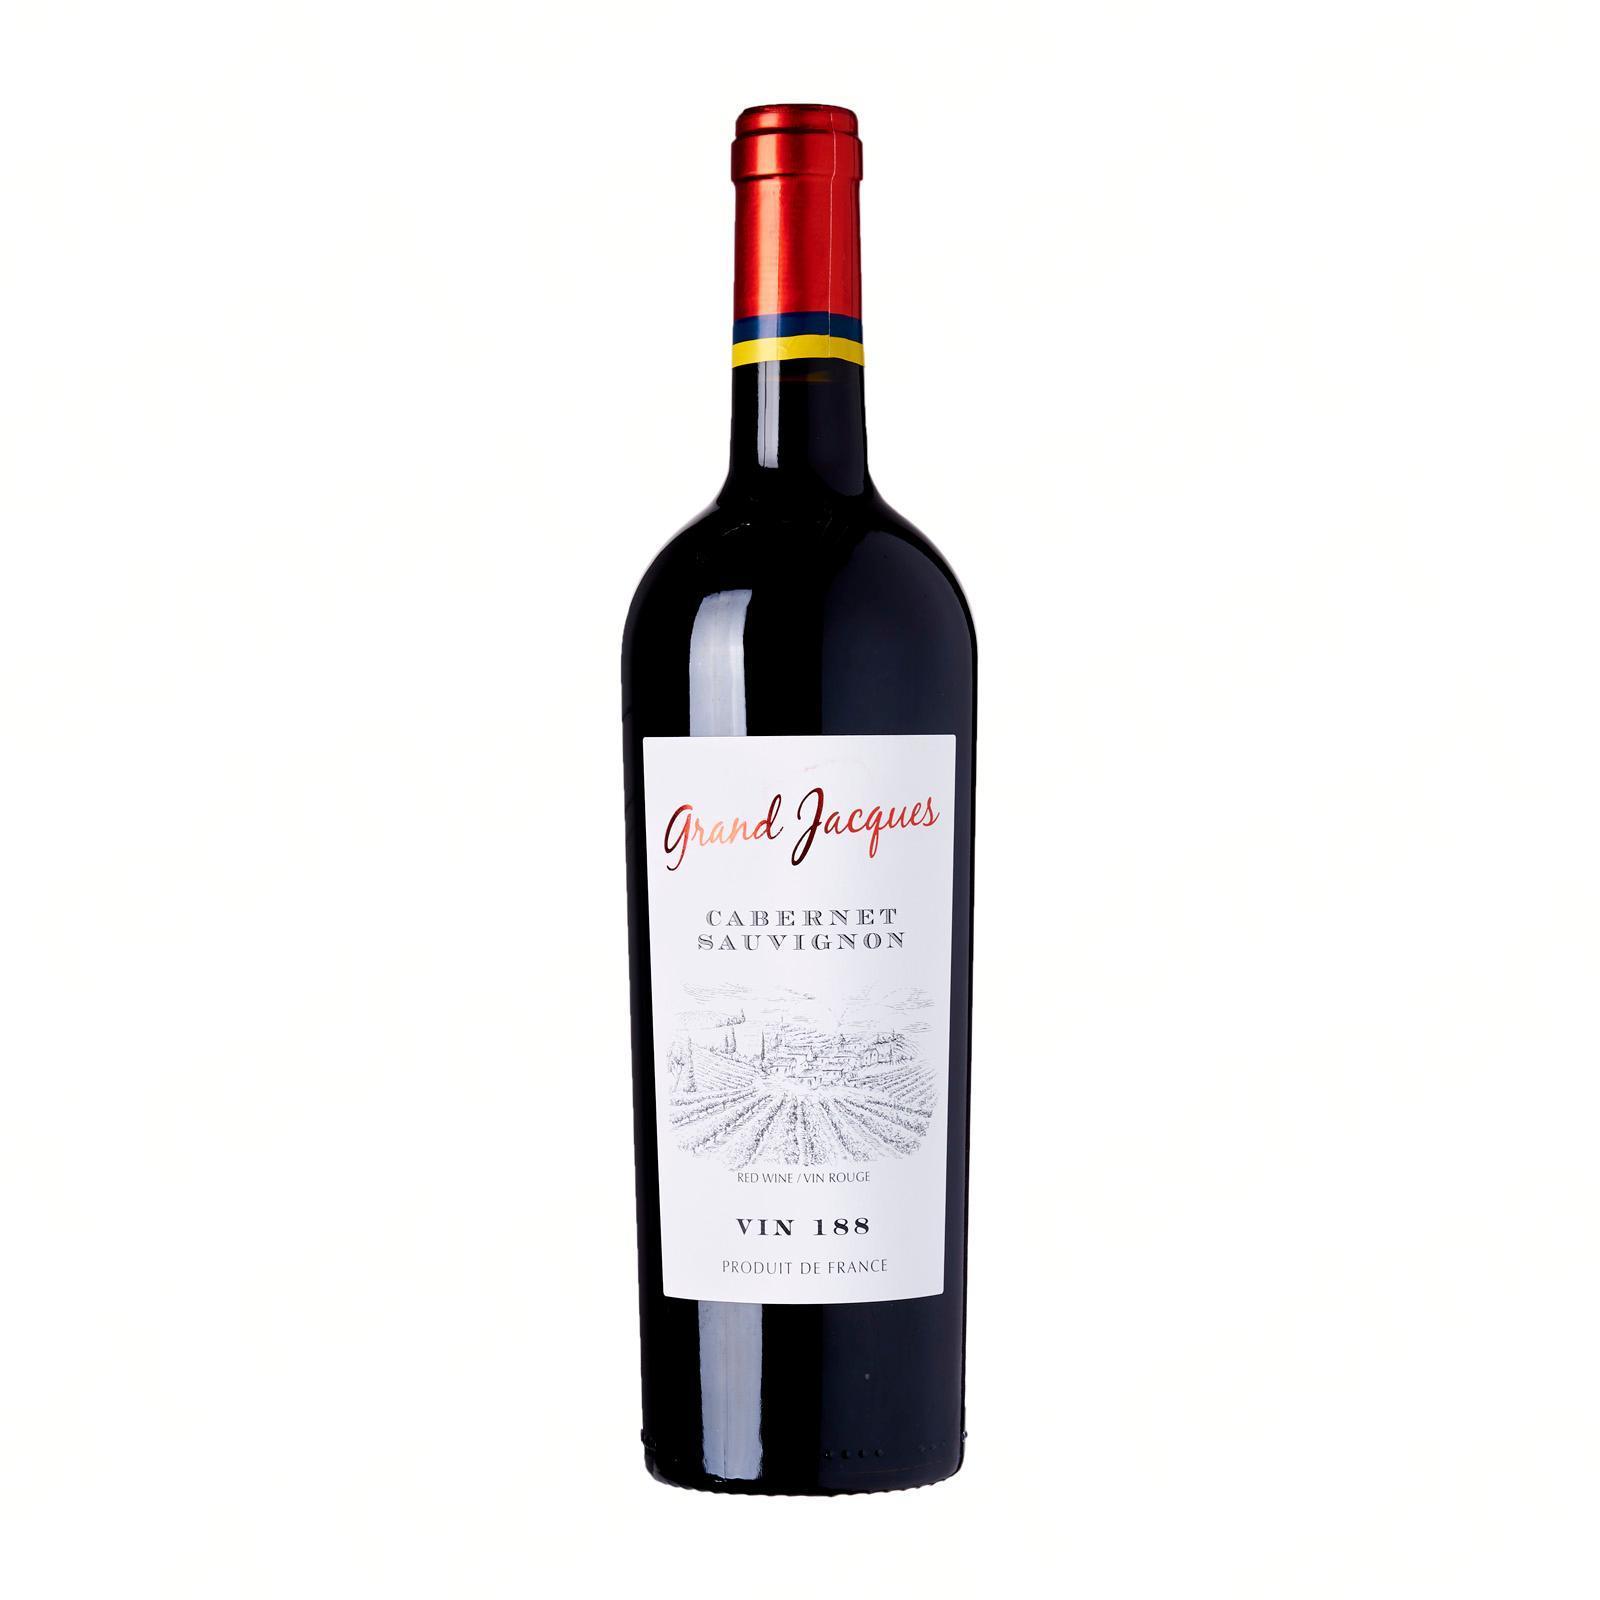 GRAND Jacques Cabernet Sauvignon VIN 188 - By Oak and Barrel